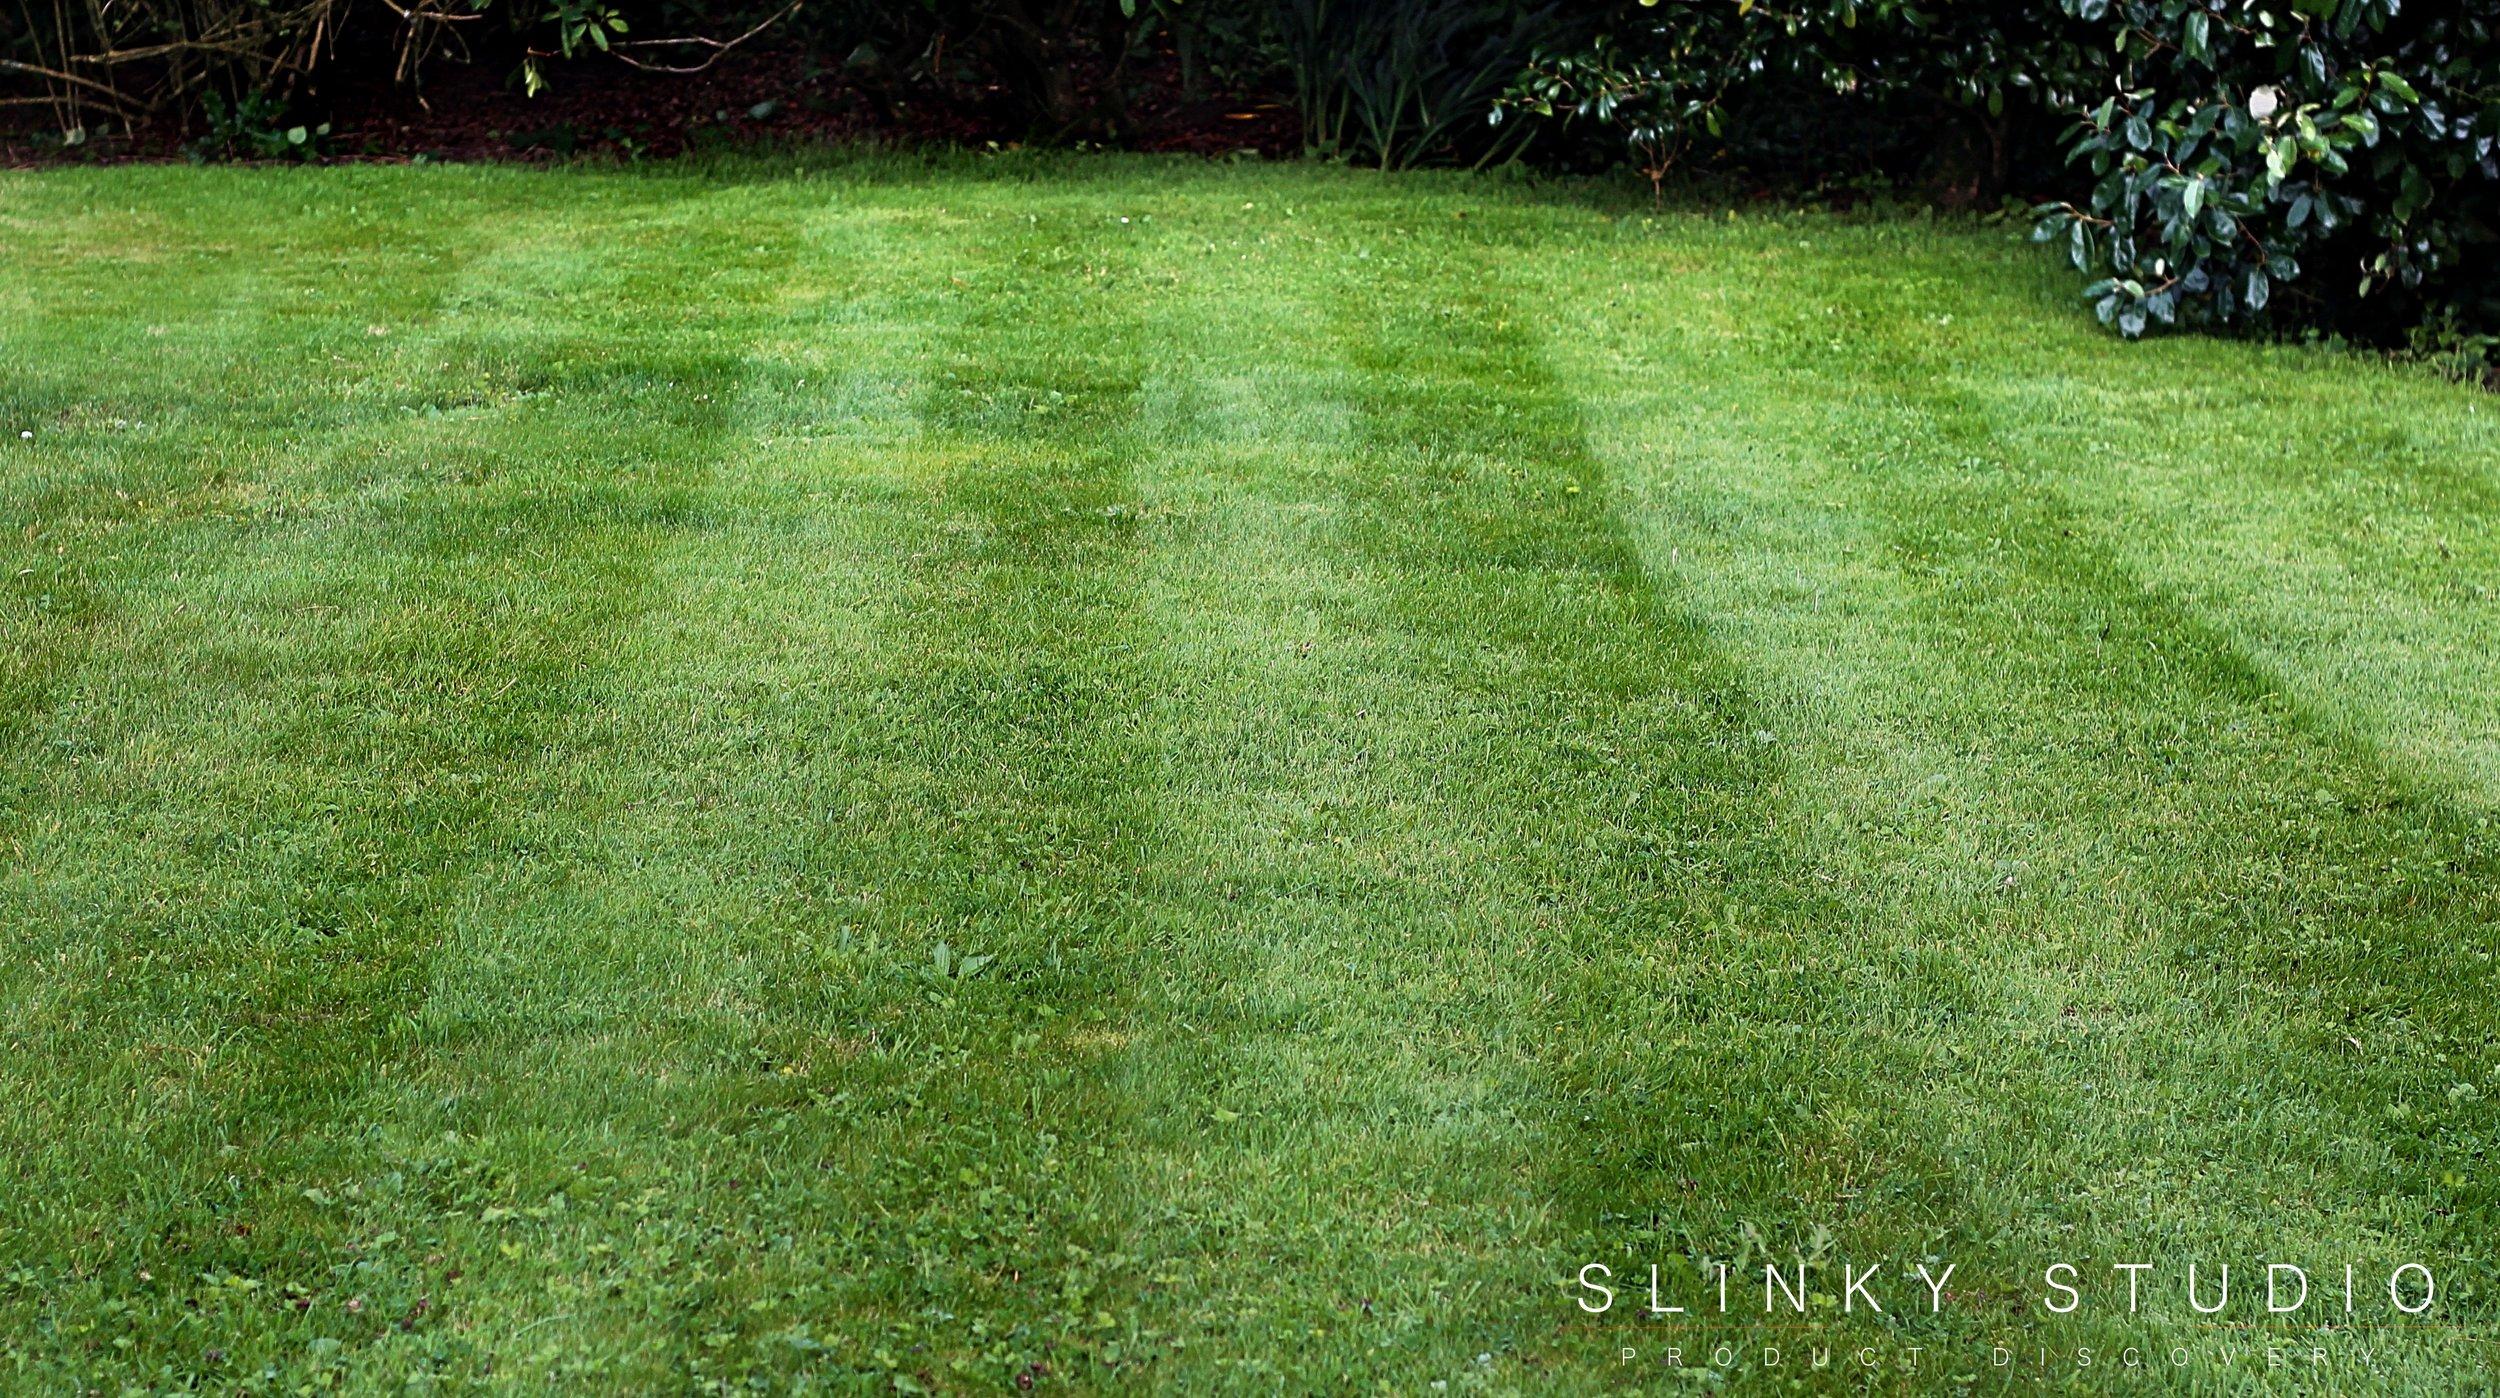 Bosch Rotak 43 LI Ergoflex Cordless Lawnmower Striped Lawn.jpg